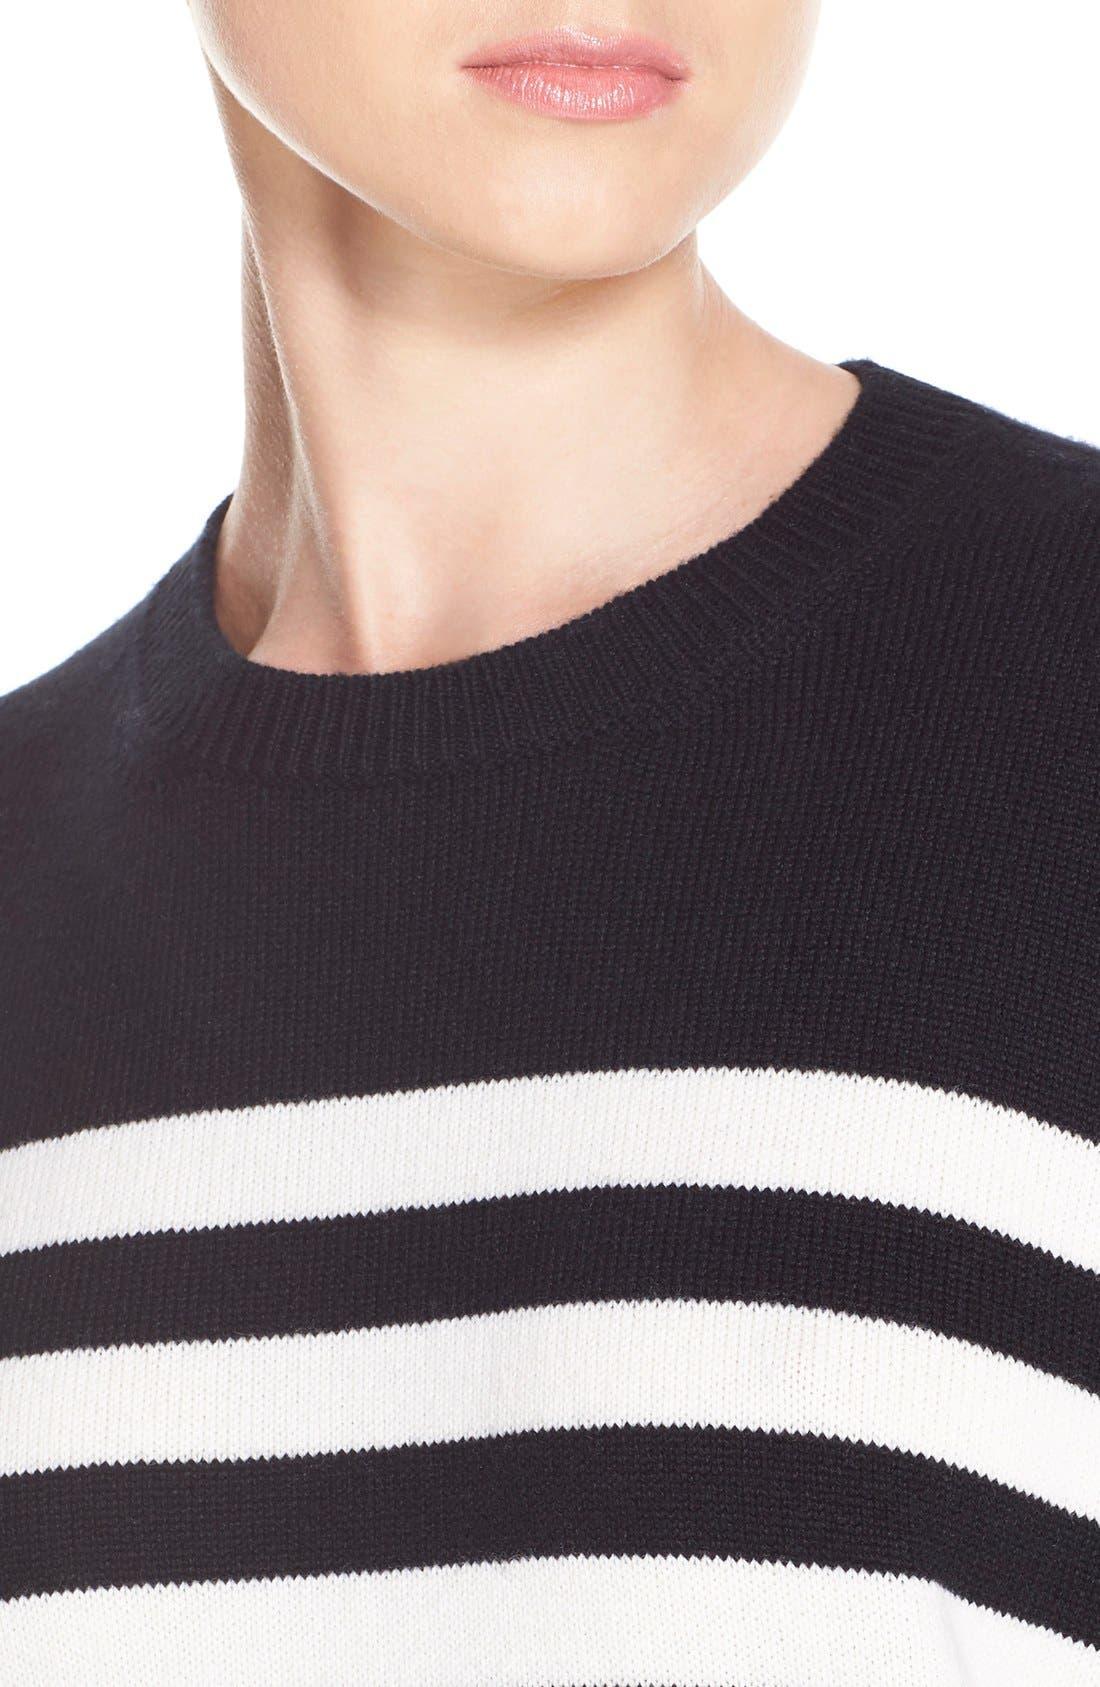 Stripe Cashmere Sweater,                             Alternate thumbnail 5, color,                             BLACK CREME